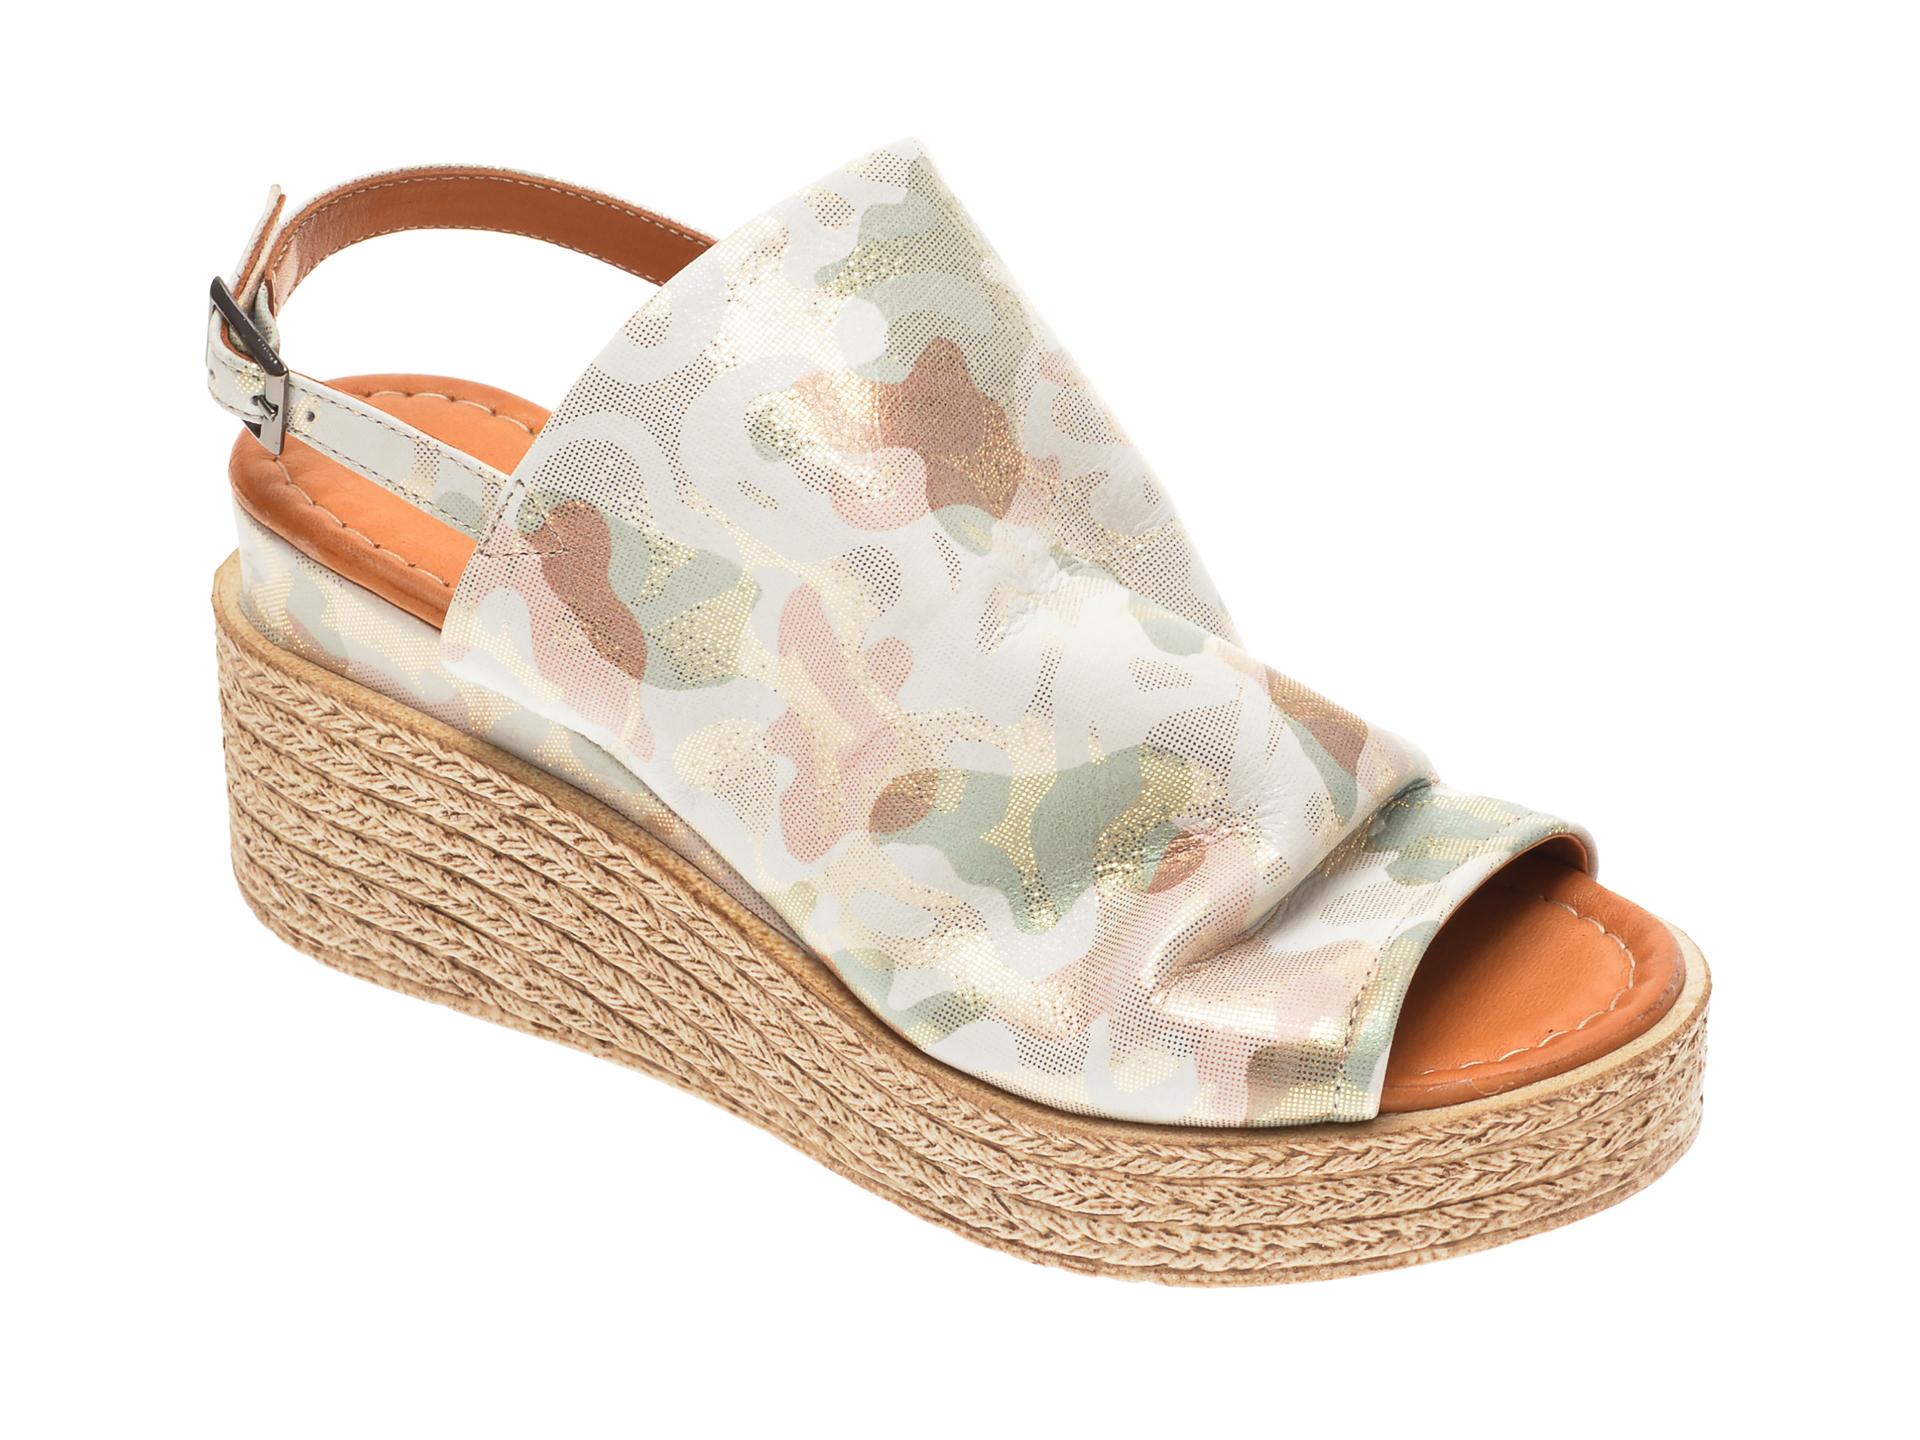 Sandale FLAVIA PASSINI multicolore, 1182832, din piele naturala